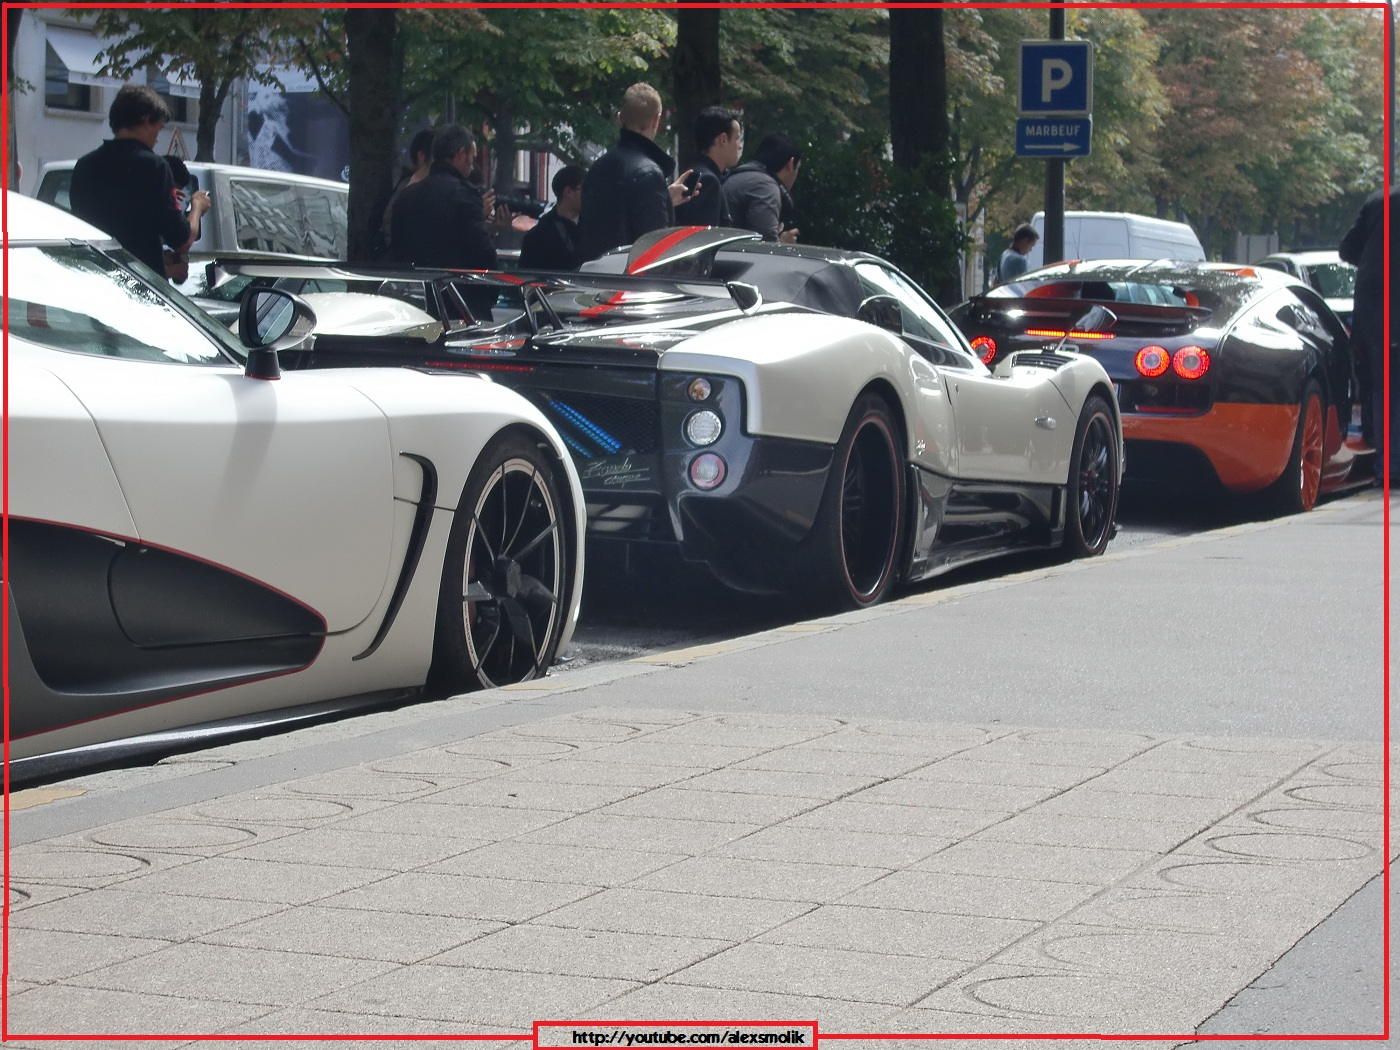 pagani huayra, koenigsegg agera r or bugatti veyron ss - page 2